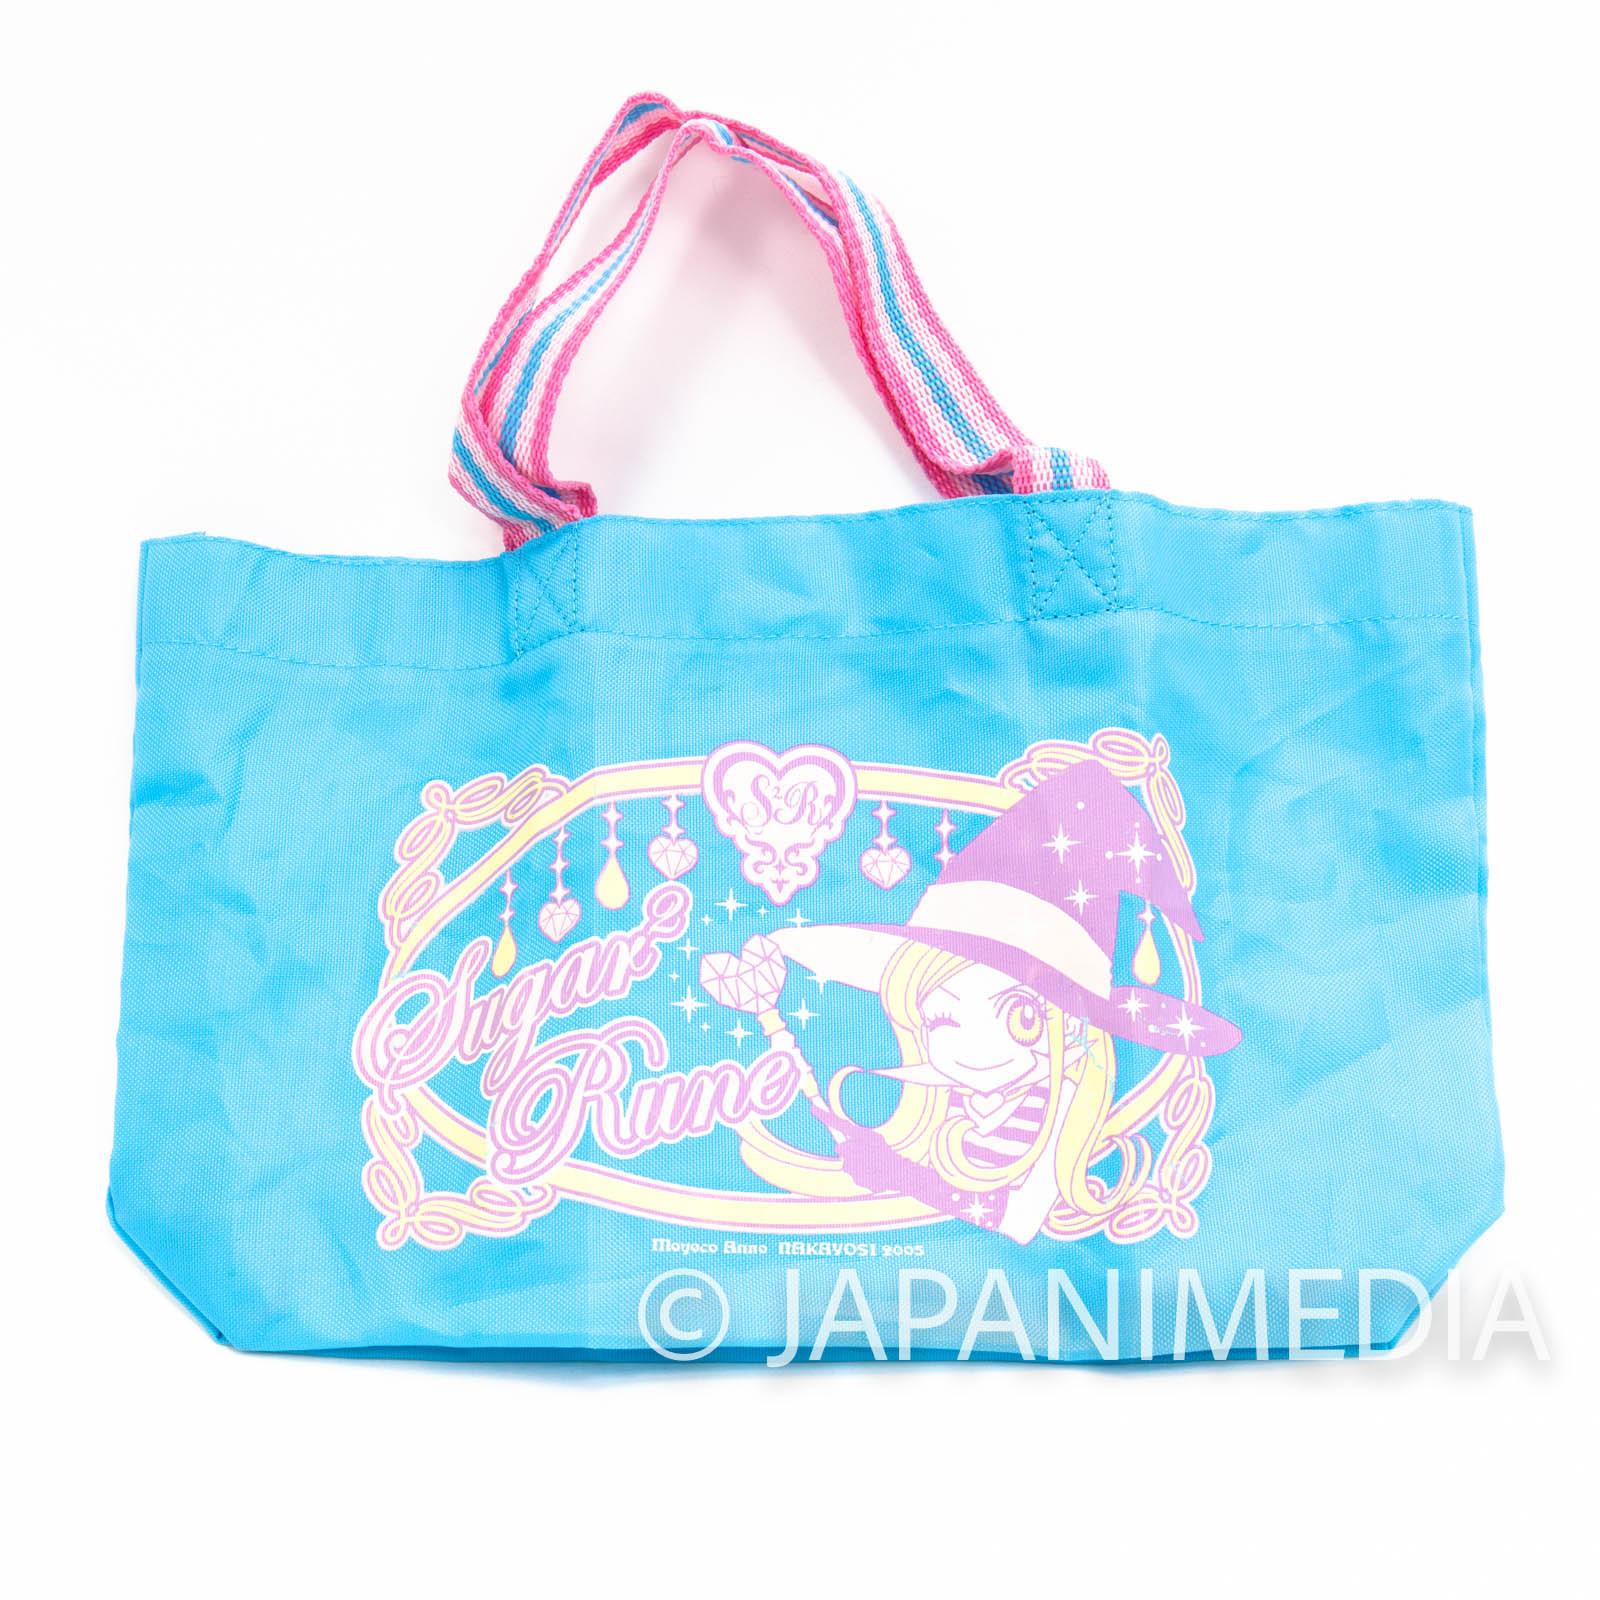 Sugar Sugar Rune Summer magical bag [Chocola Meilleure] JAPAN MANGA